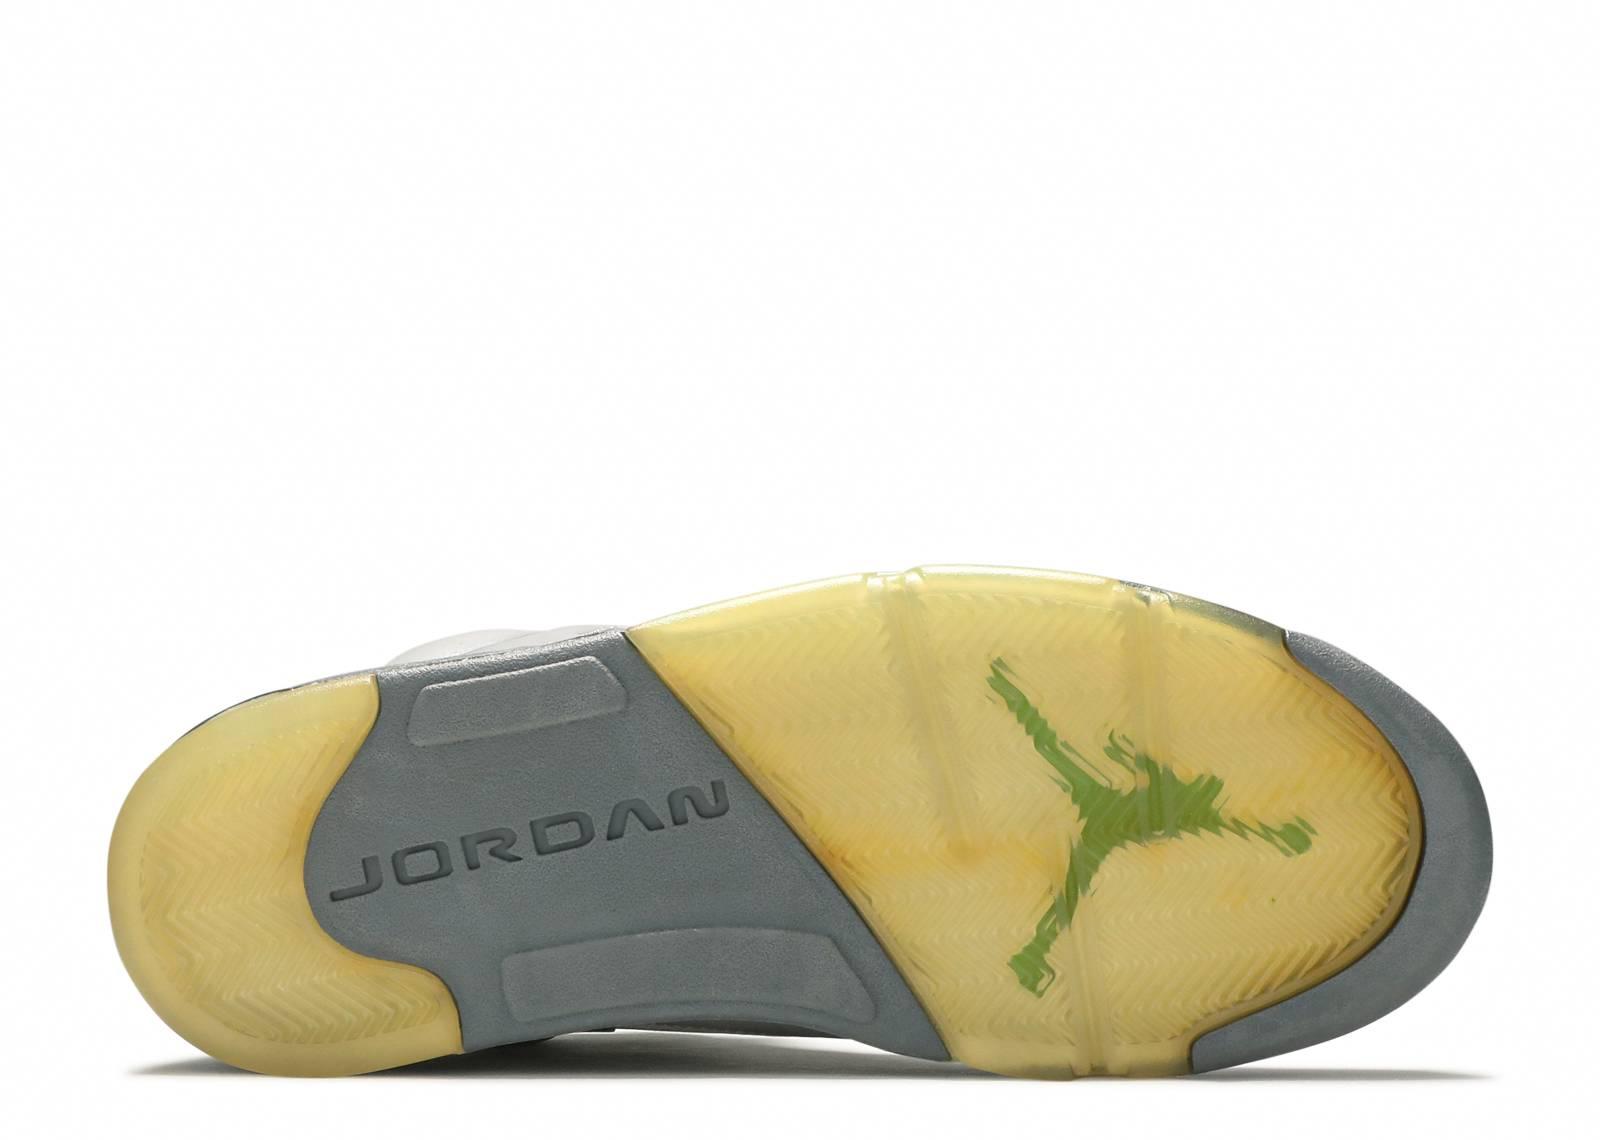 6d83111ded4e Air Jordan 5 Retro